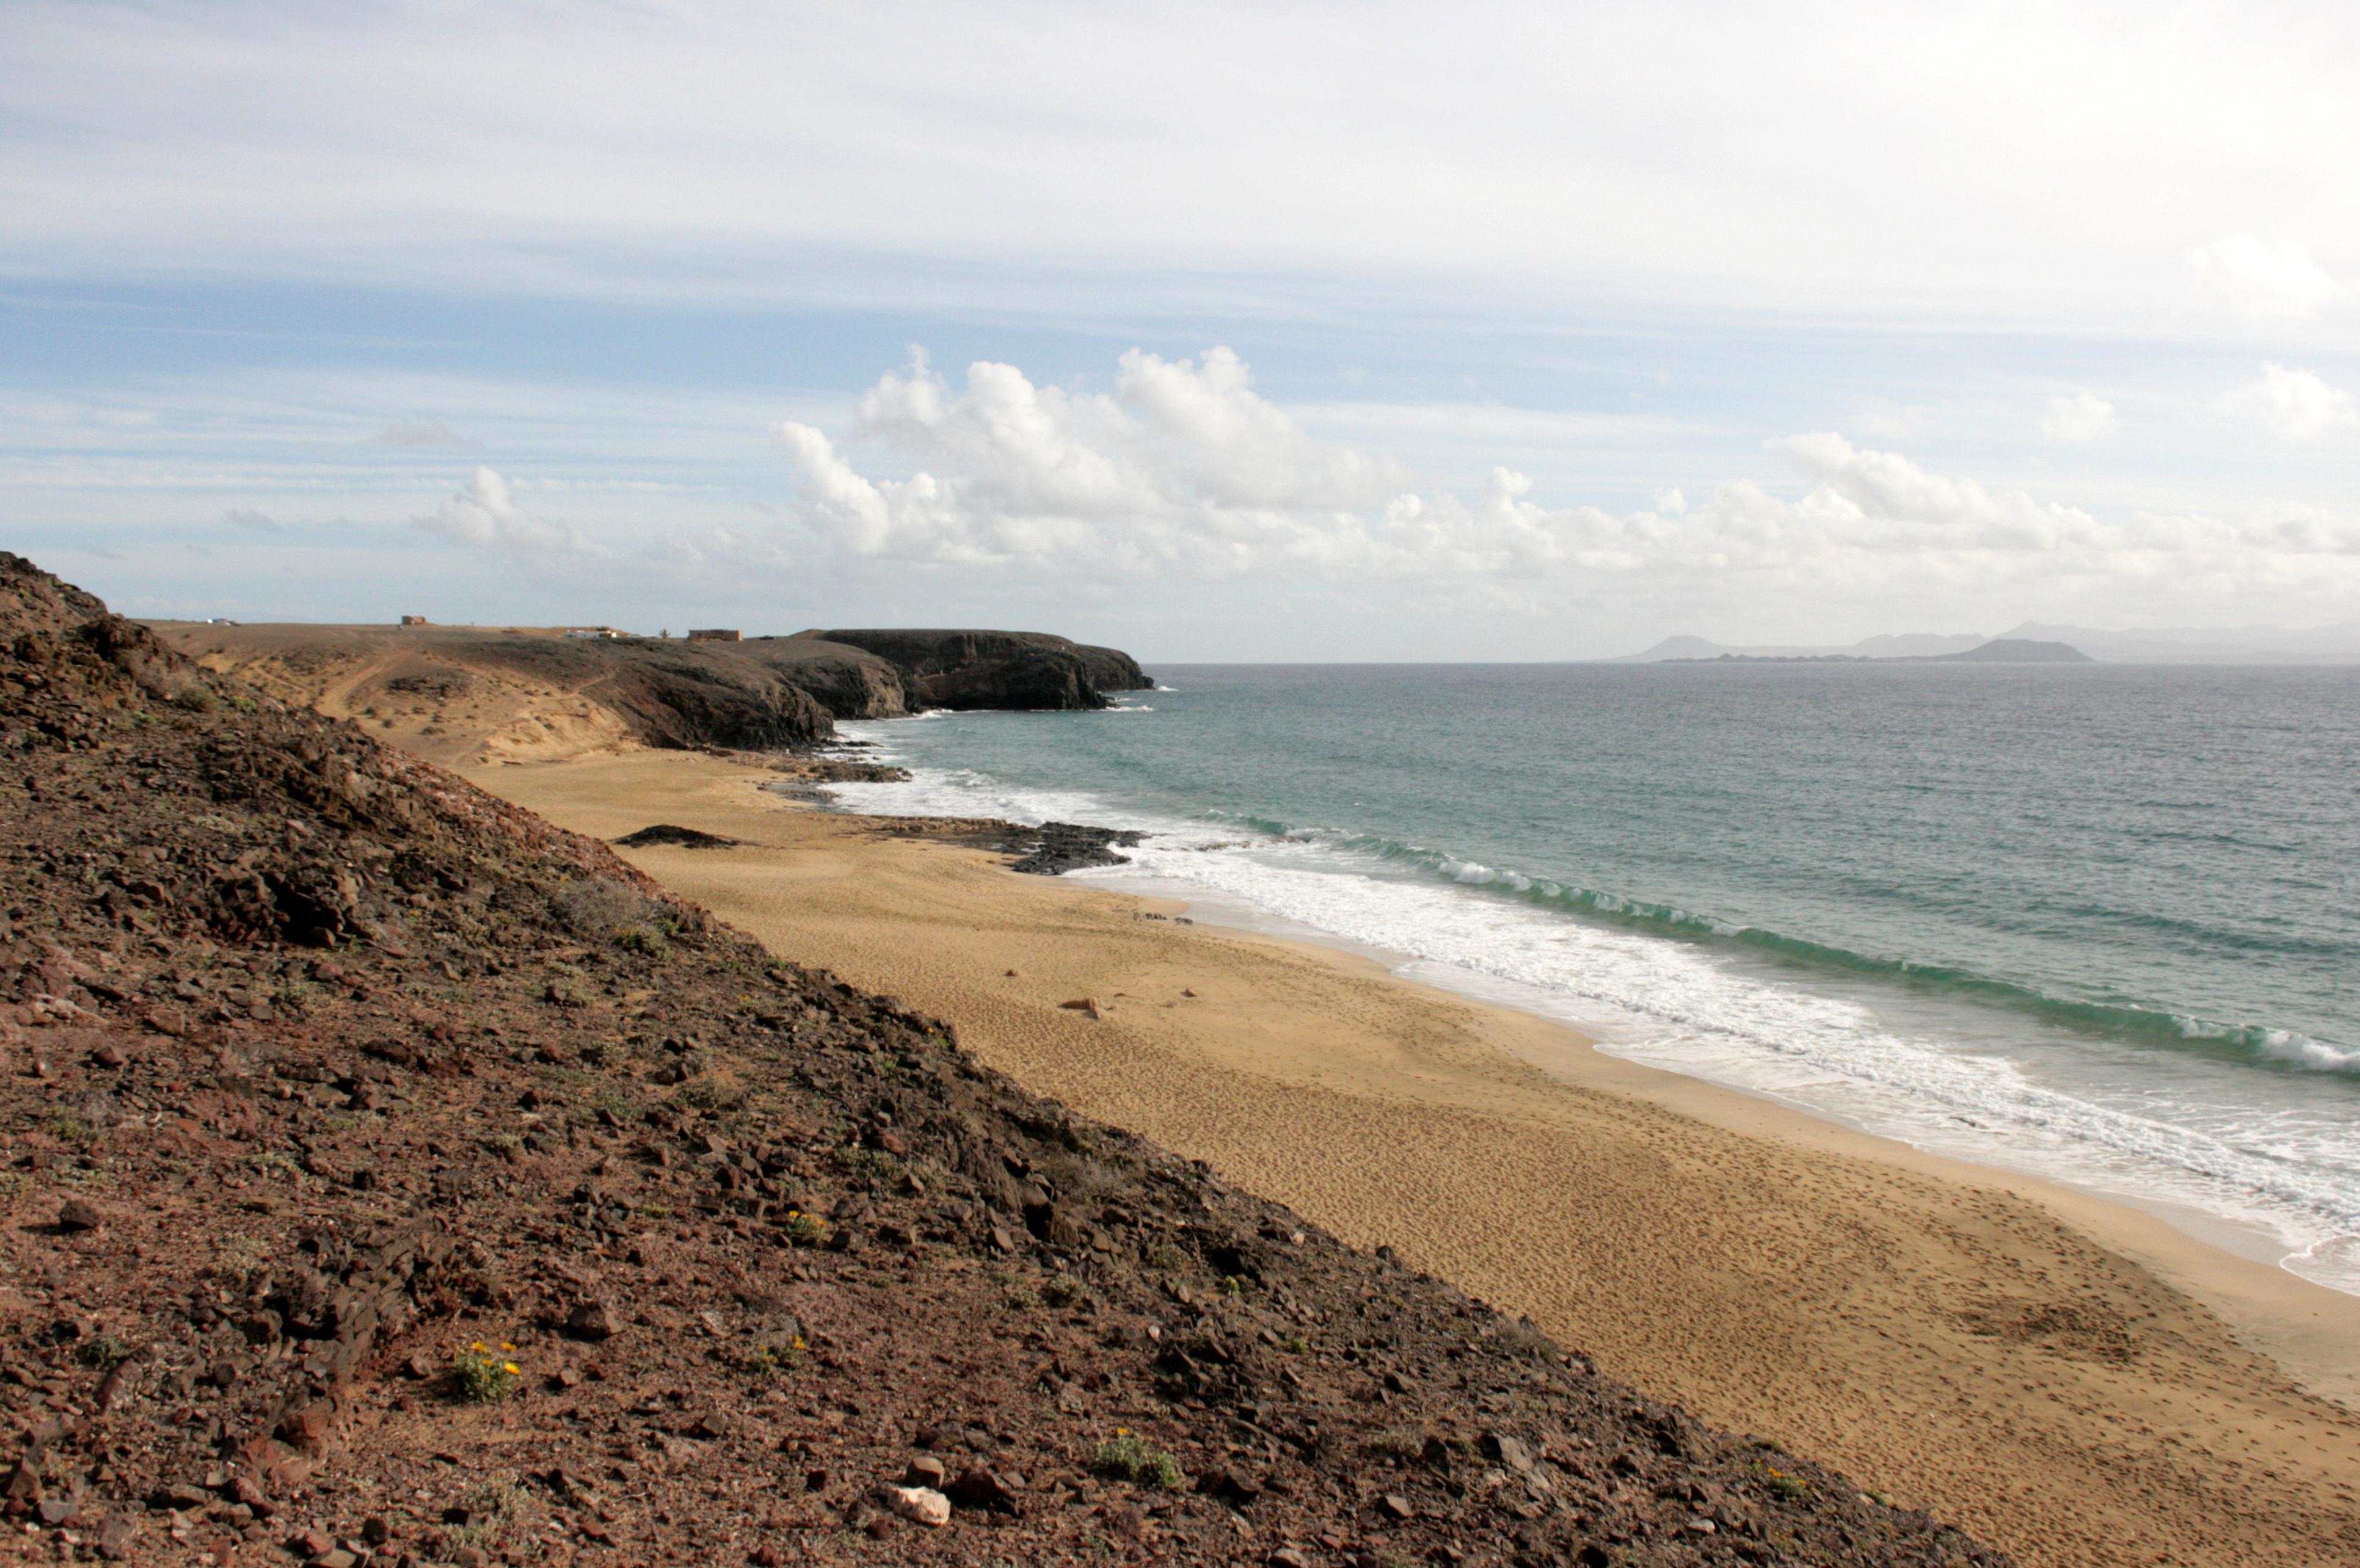 Playa Caletón de San Marcial